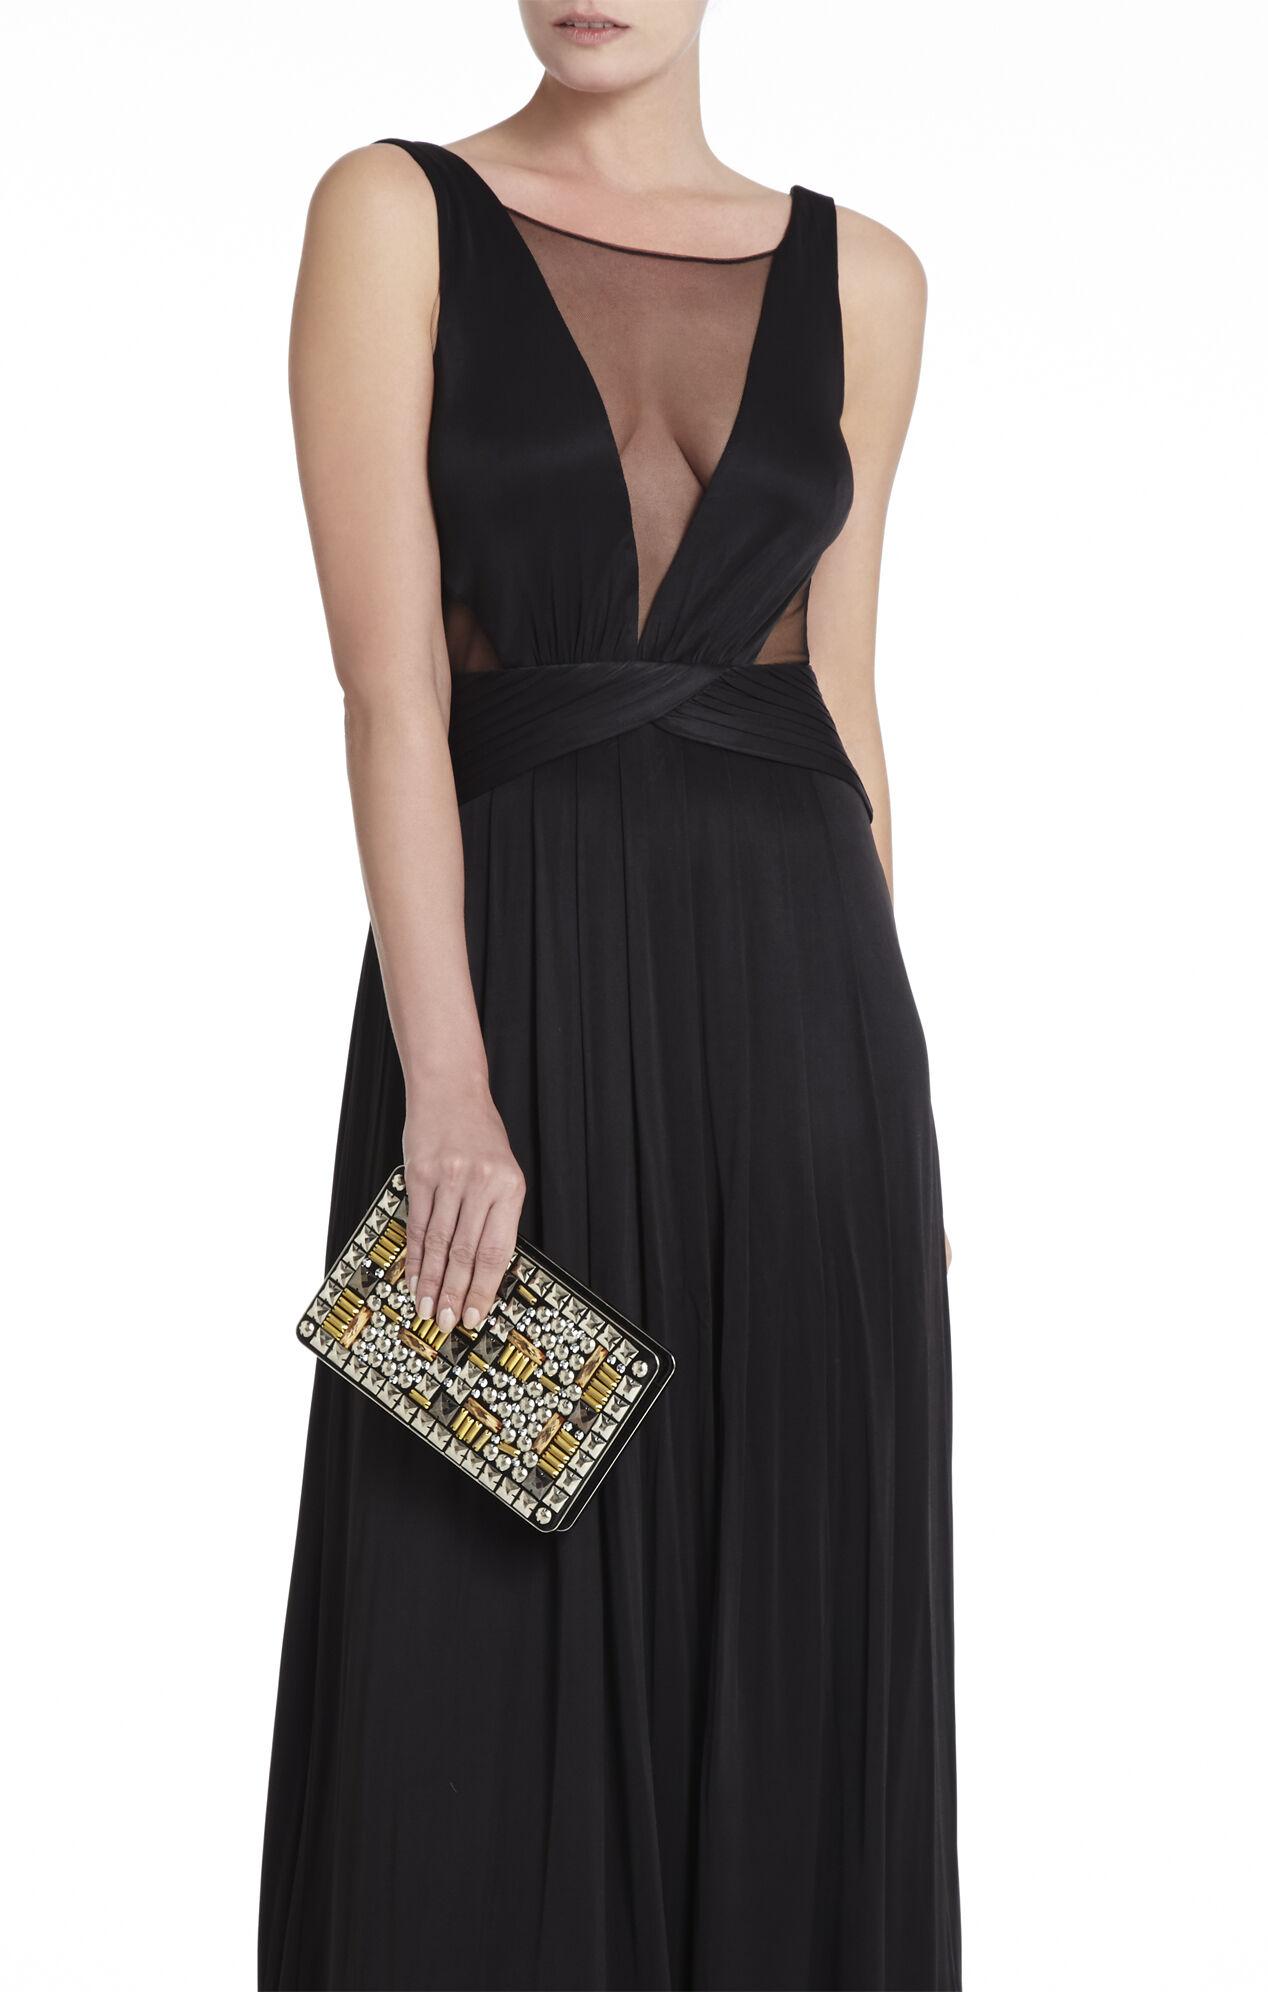 Taryn Studded Zip-Frame Clutch